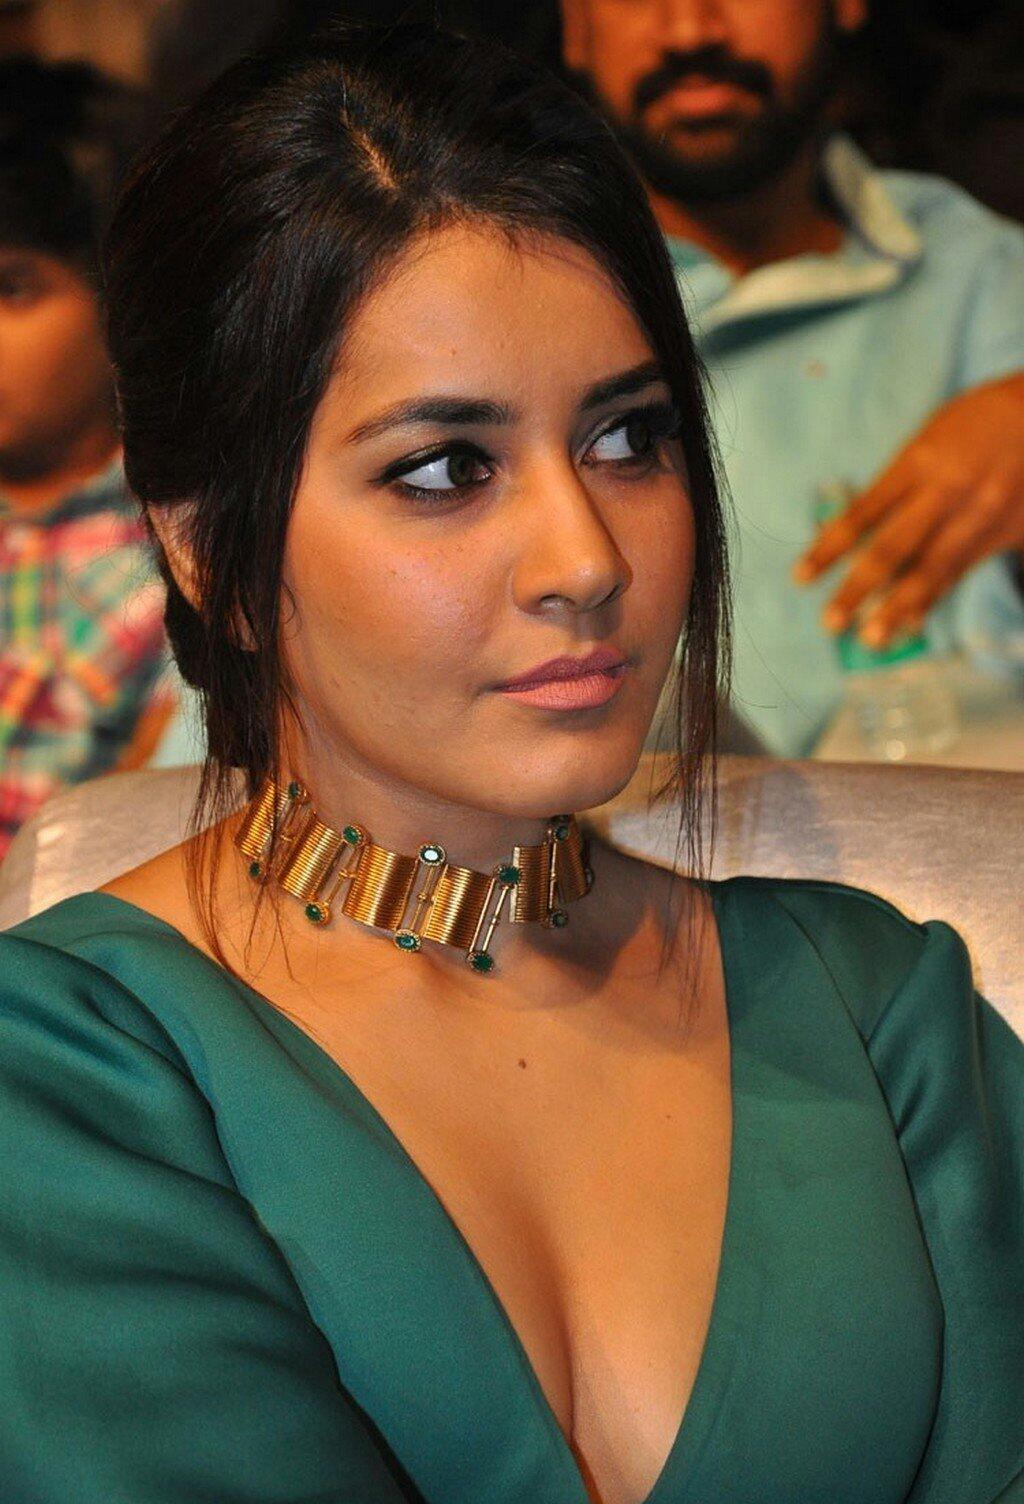 Rashi Khanna Sexy Deep Cleavage At Hyper Trailer Launch 9 1 - Rashi Khanna Sexiest Cleavage Pictures Collection-Hot HD Photos